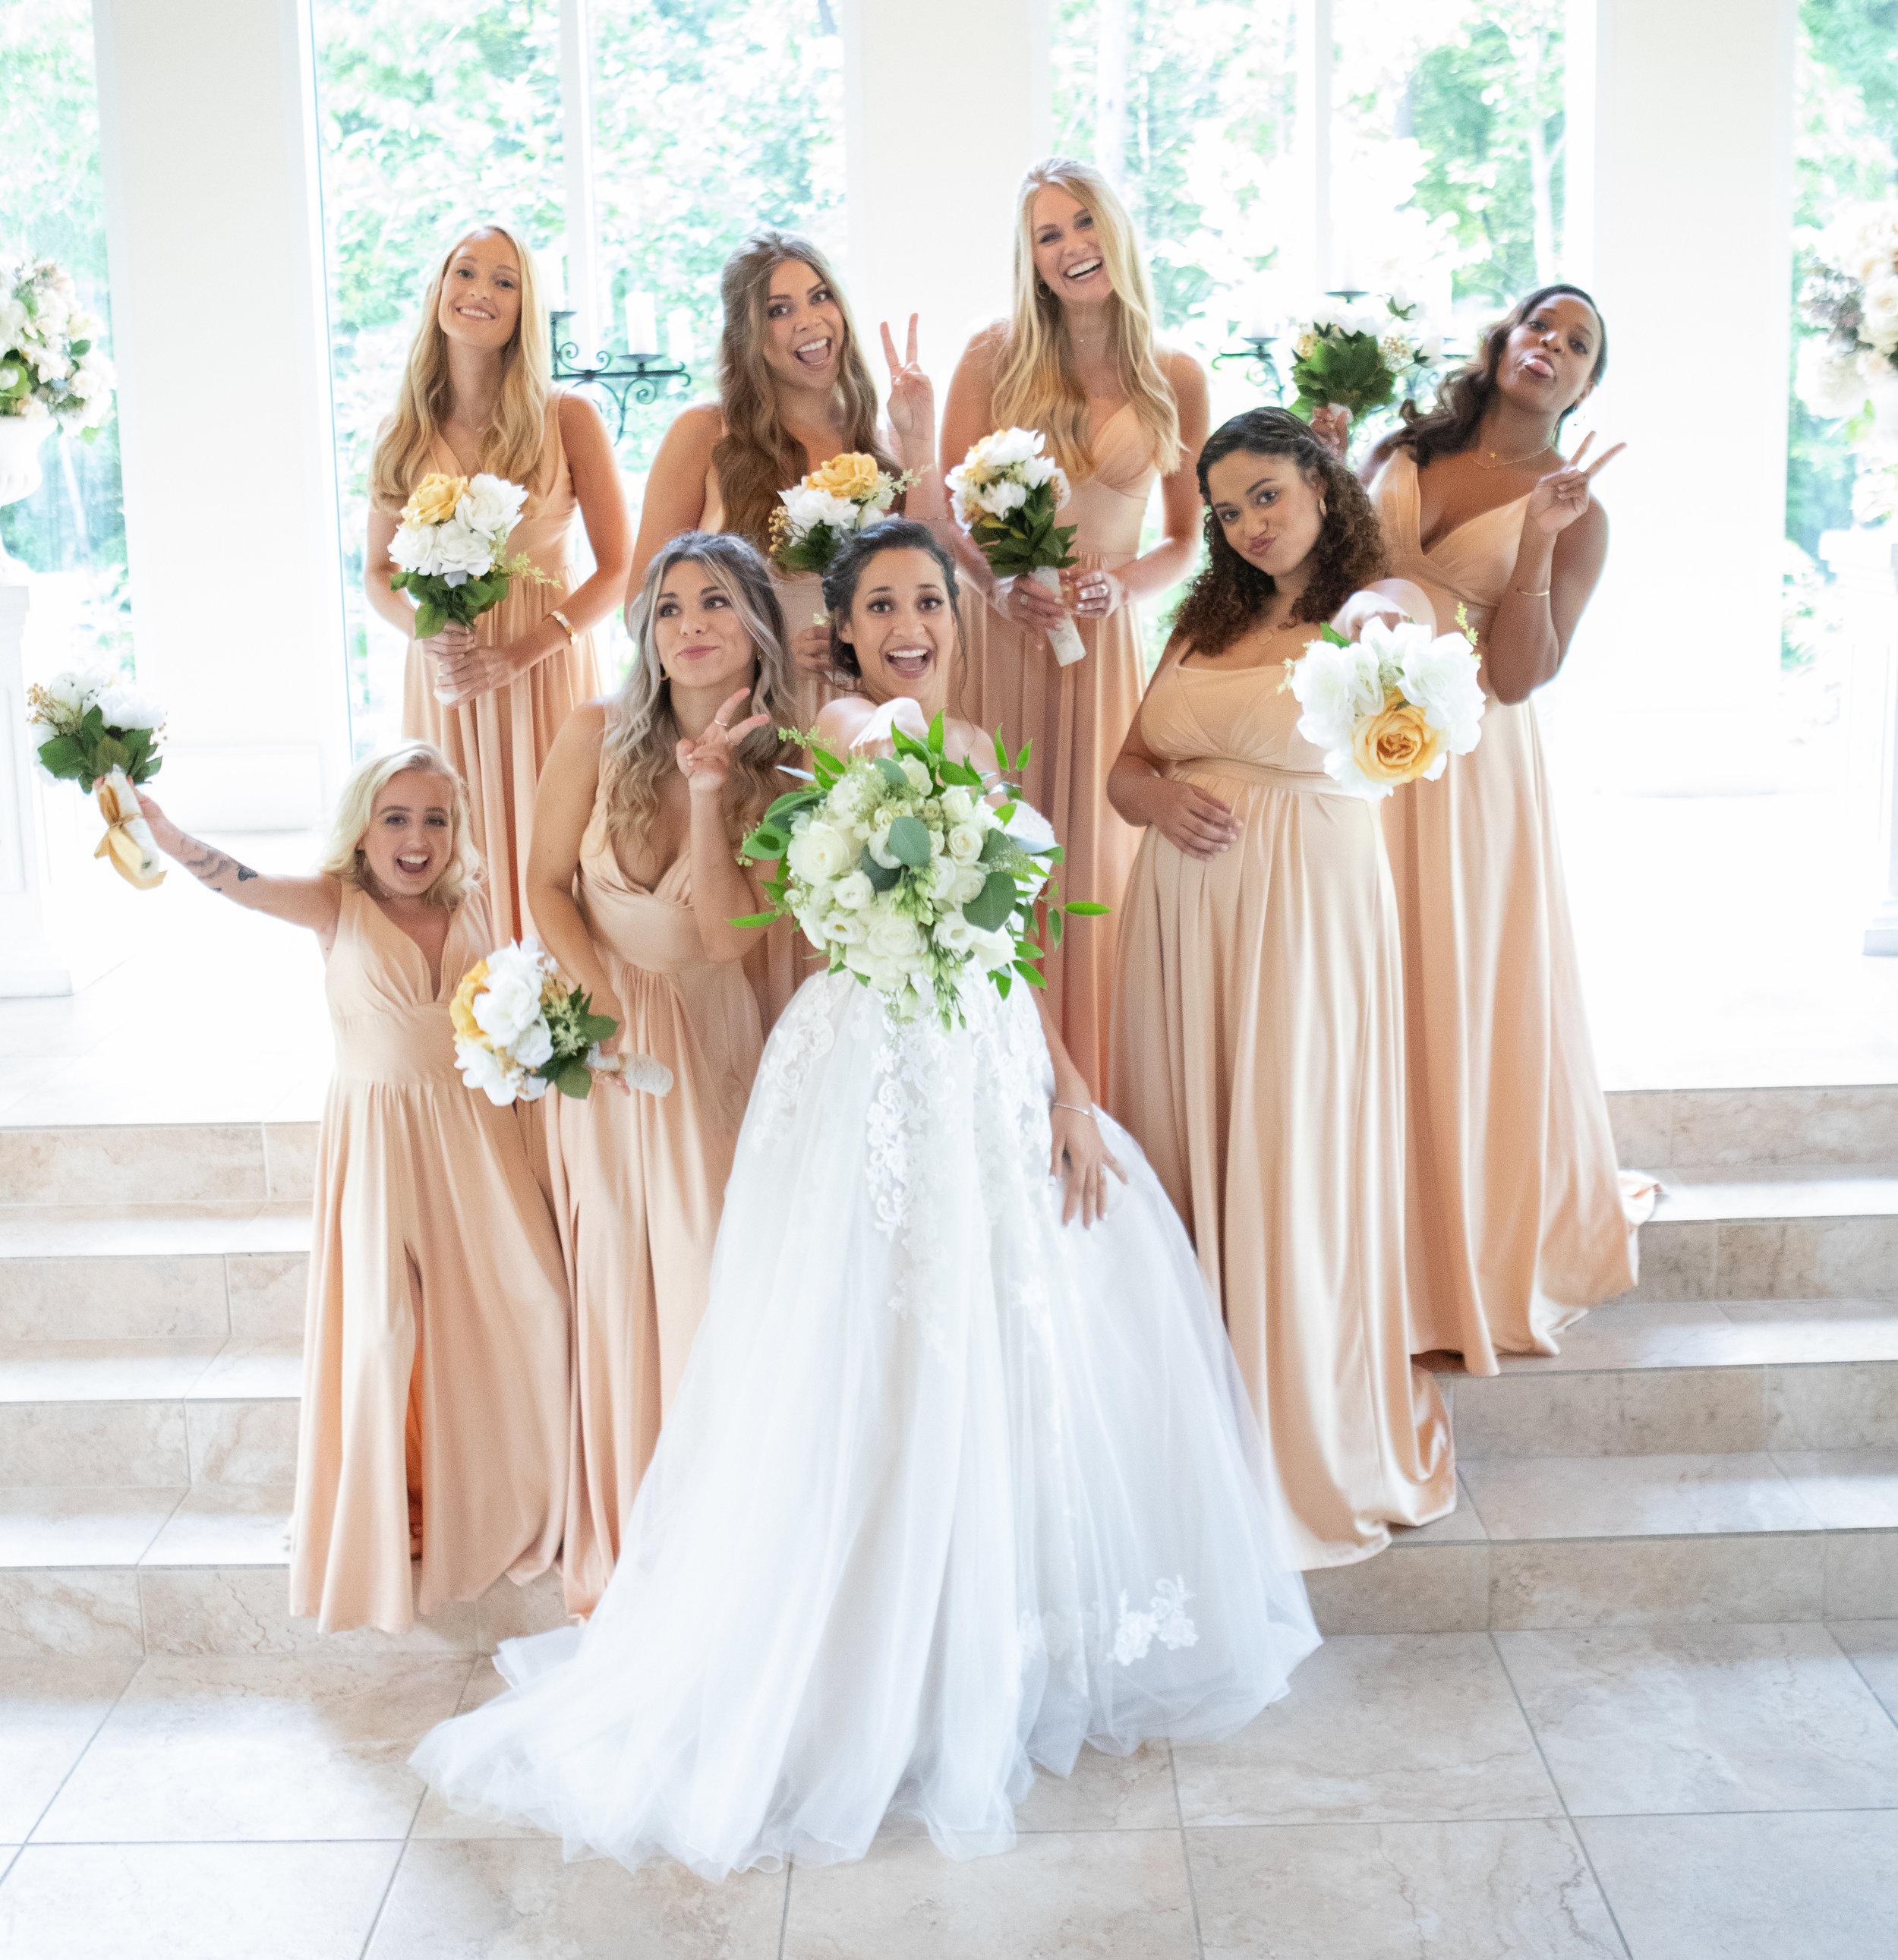 Bride with her bridesmaids photo by the Atlanta wedding photographers at AtlantaArtisticWeddings